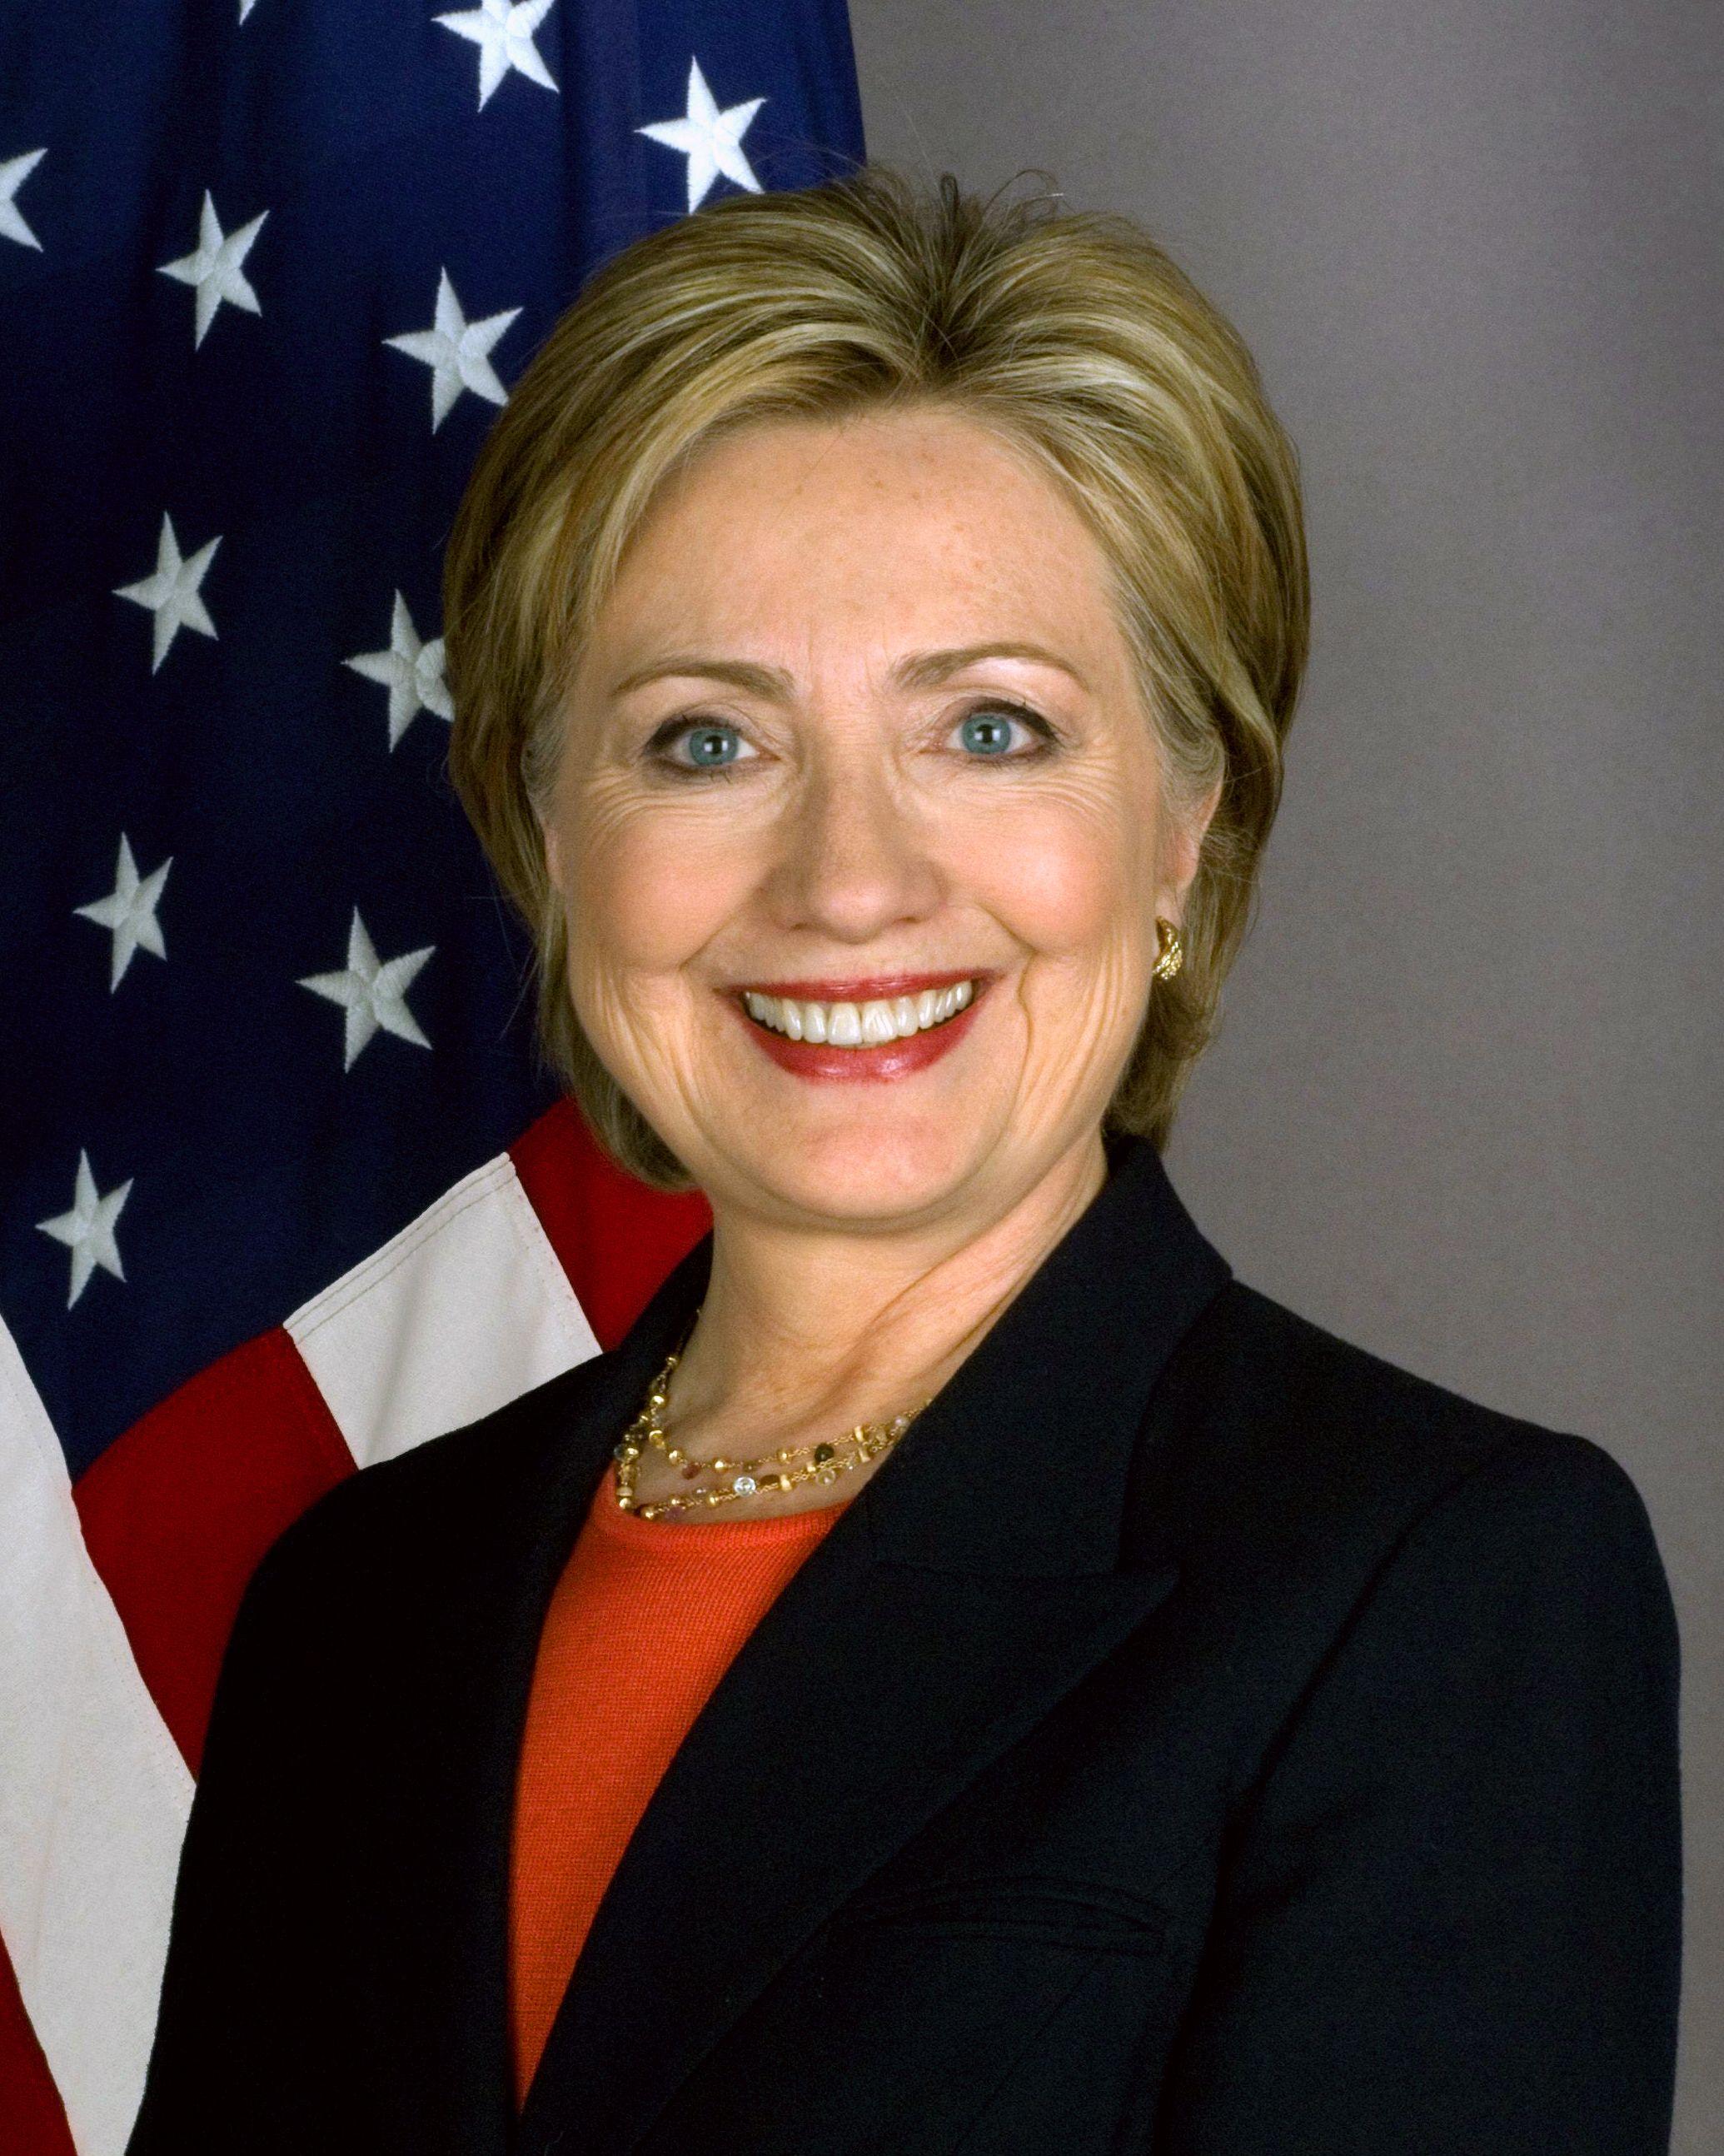 Hillary_Clinton_official_Secretary_of_State_portrait_crop-compressor.jpg